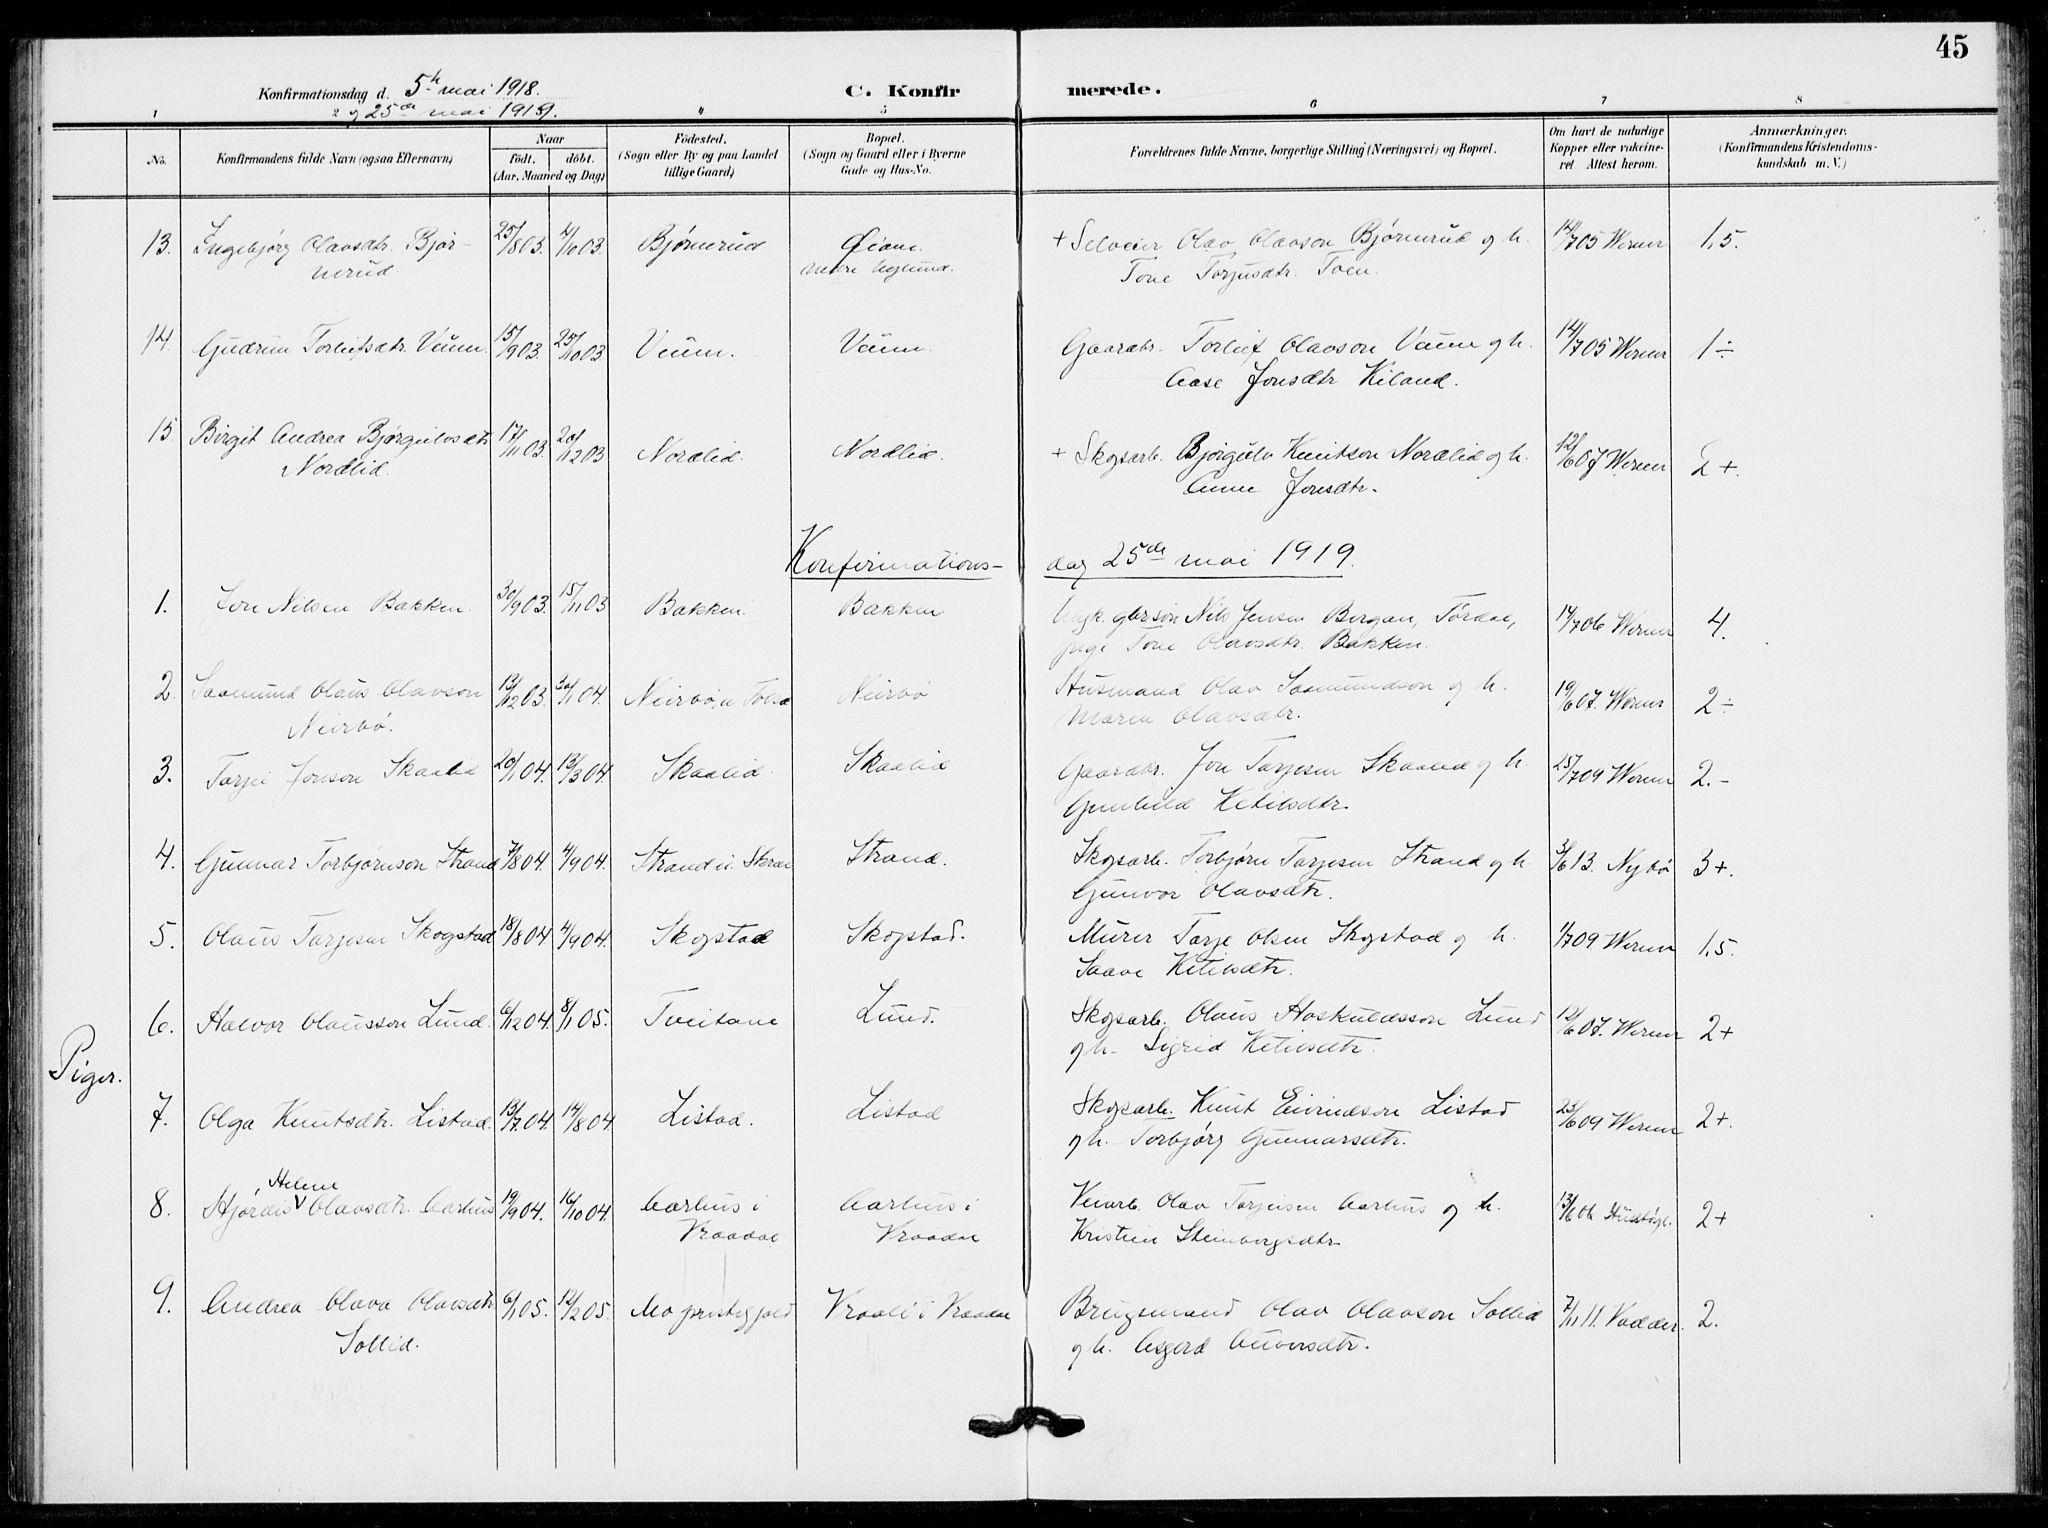 SAKO, Fyresdal kirkebøker, F/Fb/L0004: Ministerialbok nr. II 4, 1903-1920, s. 45